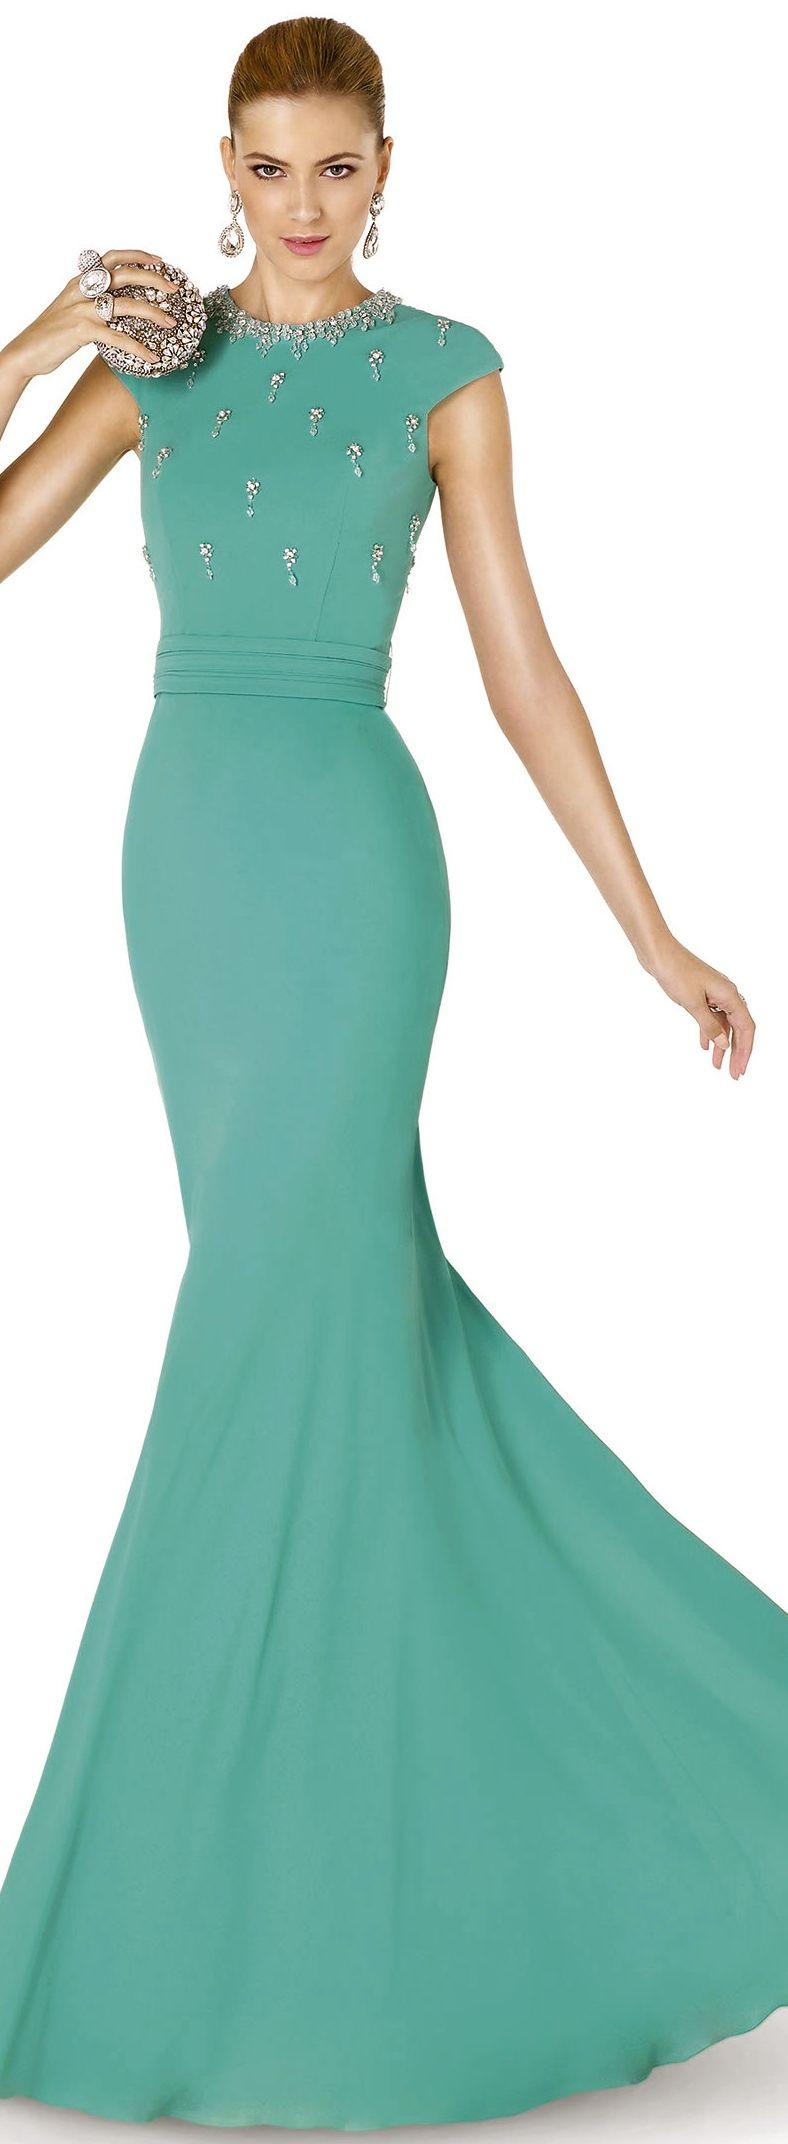 Pronovias Cocktail Collection 2015 stunning bridesmaids dress idea ...